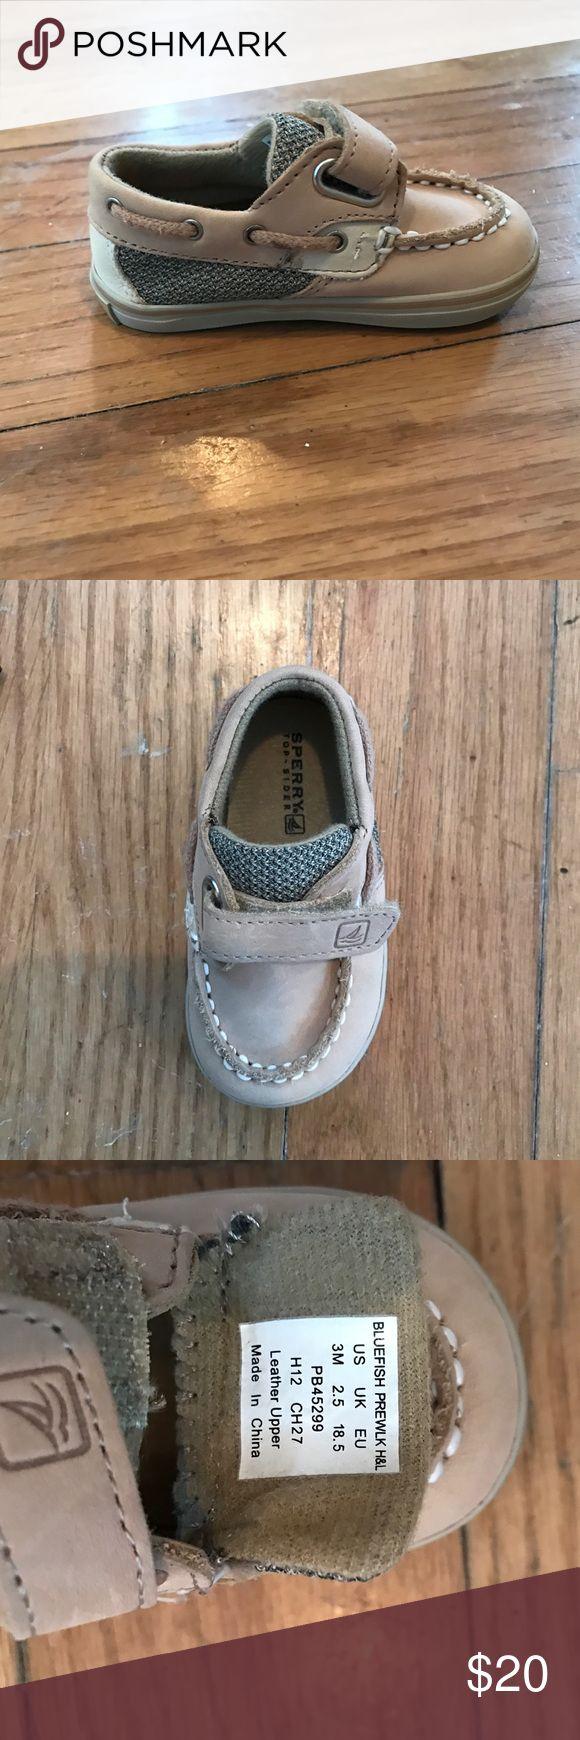 Sperrys baby size 3 NWOT baby sperrys size 3 Sperry Shoes Baby & Walker